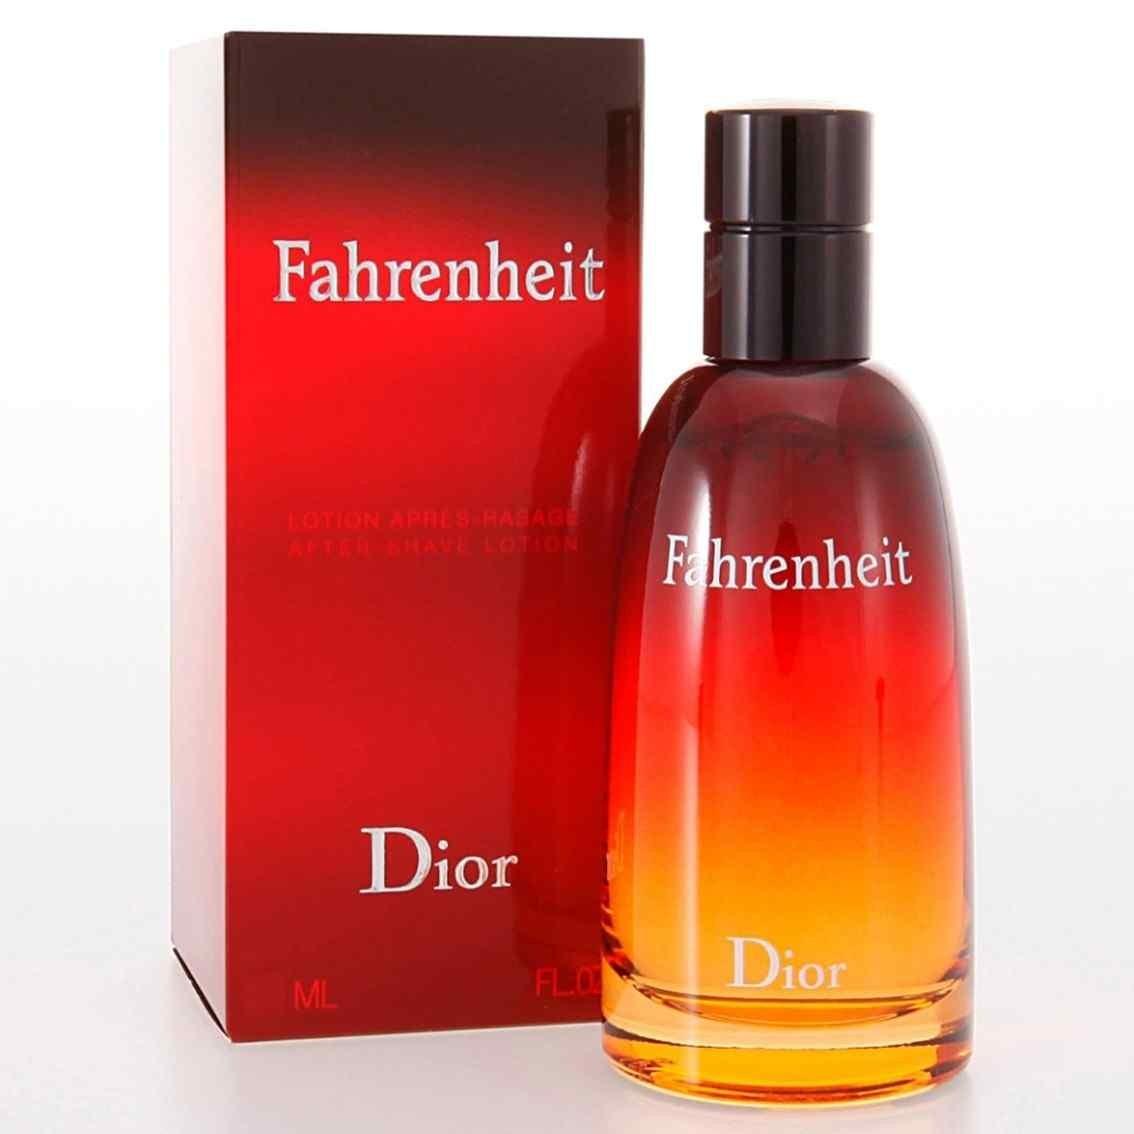 Fahrenheit Edt 100ml Christian Dior - Perfume Importado Masculino